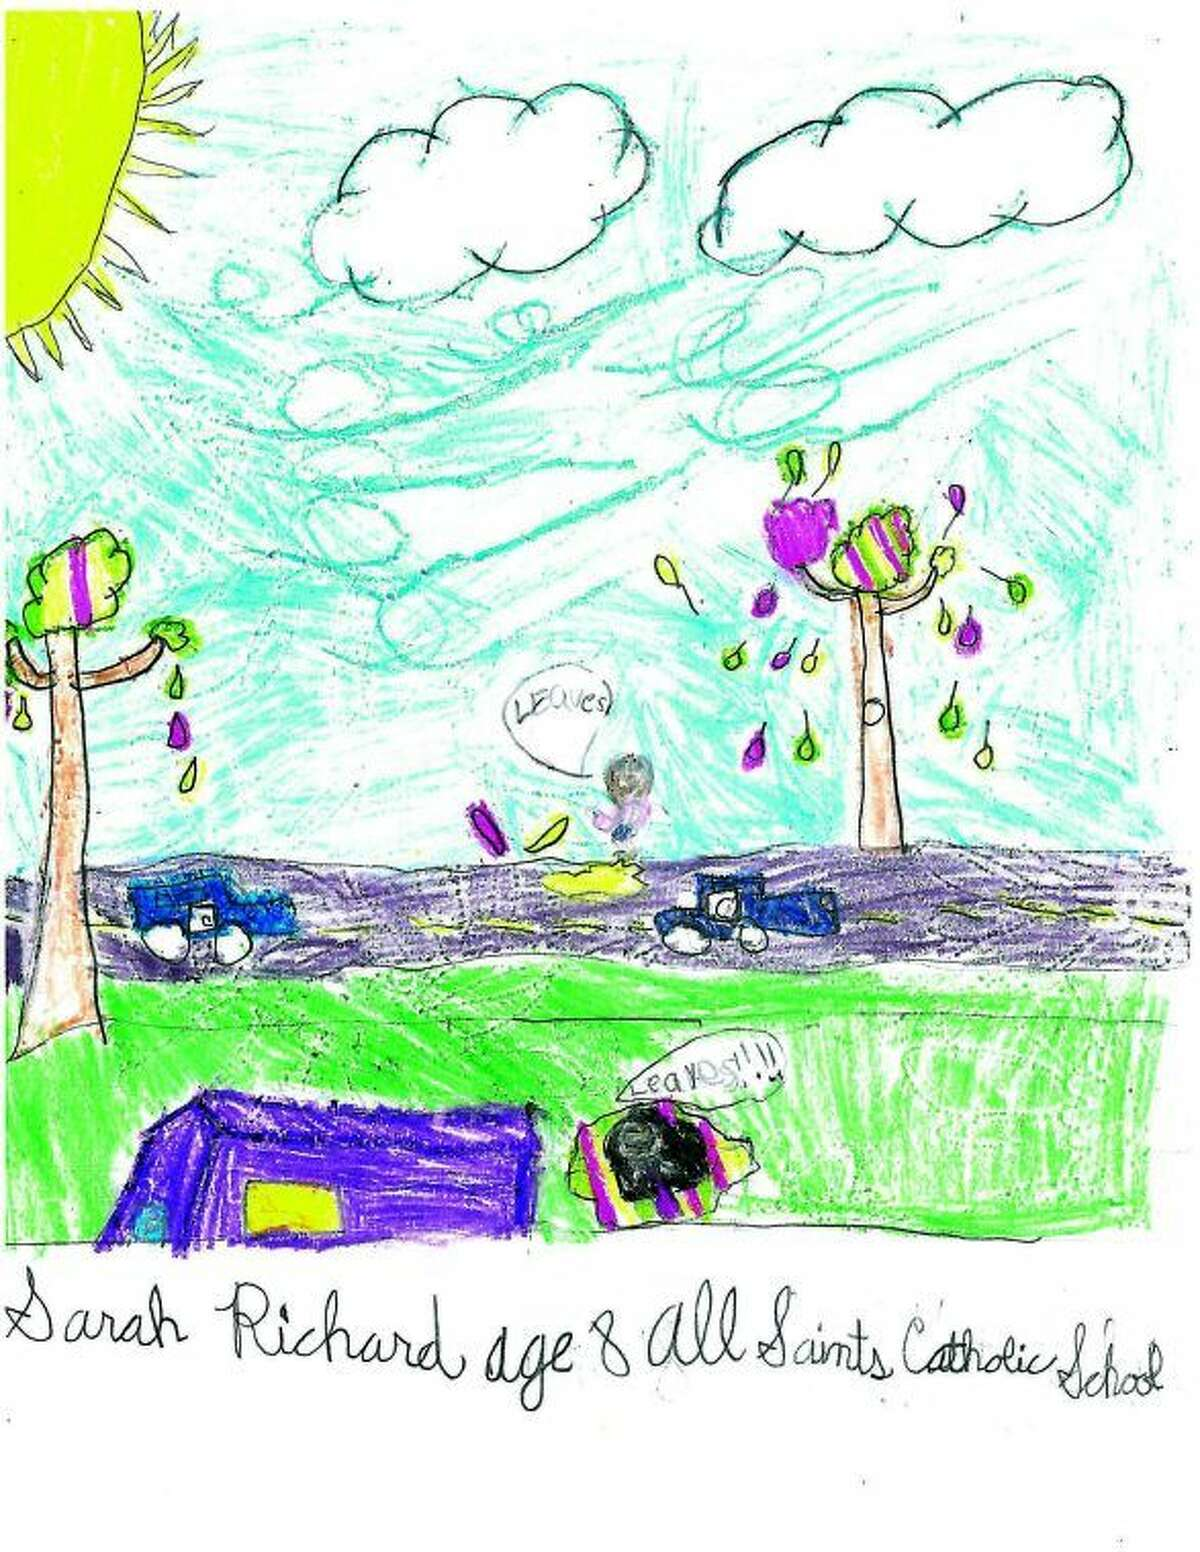 Sarah Richard, Age 8, All Saints Catholic School